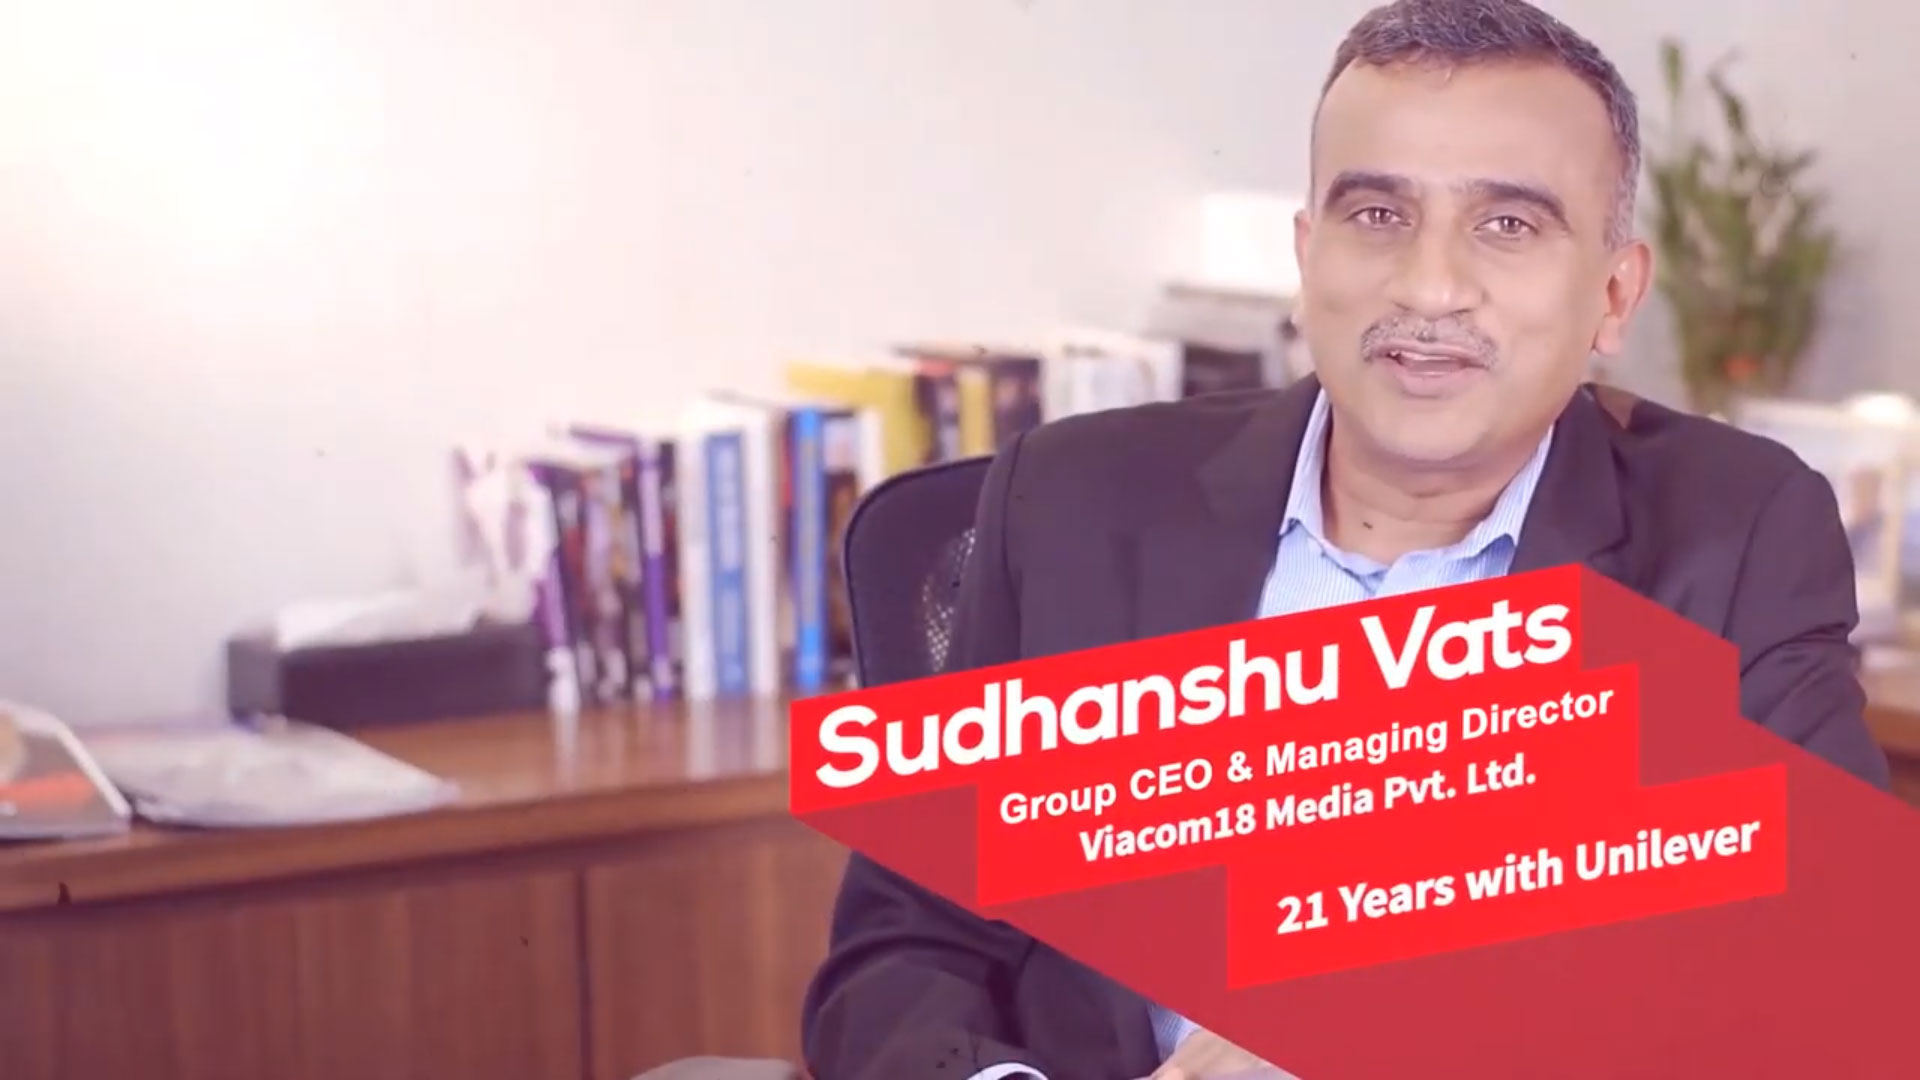 Sudhanshu Vats Group CEO & Managing Director